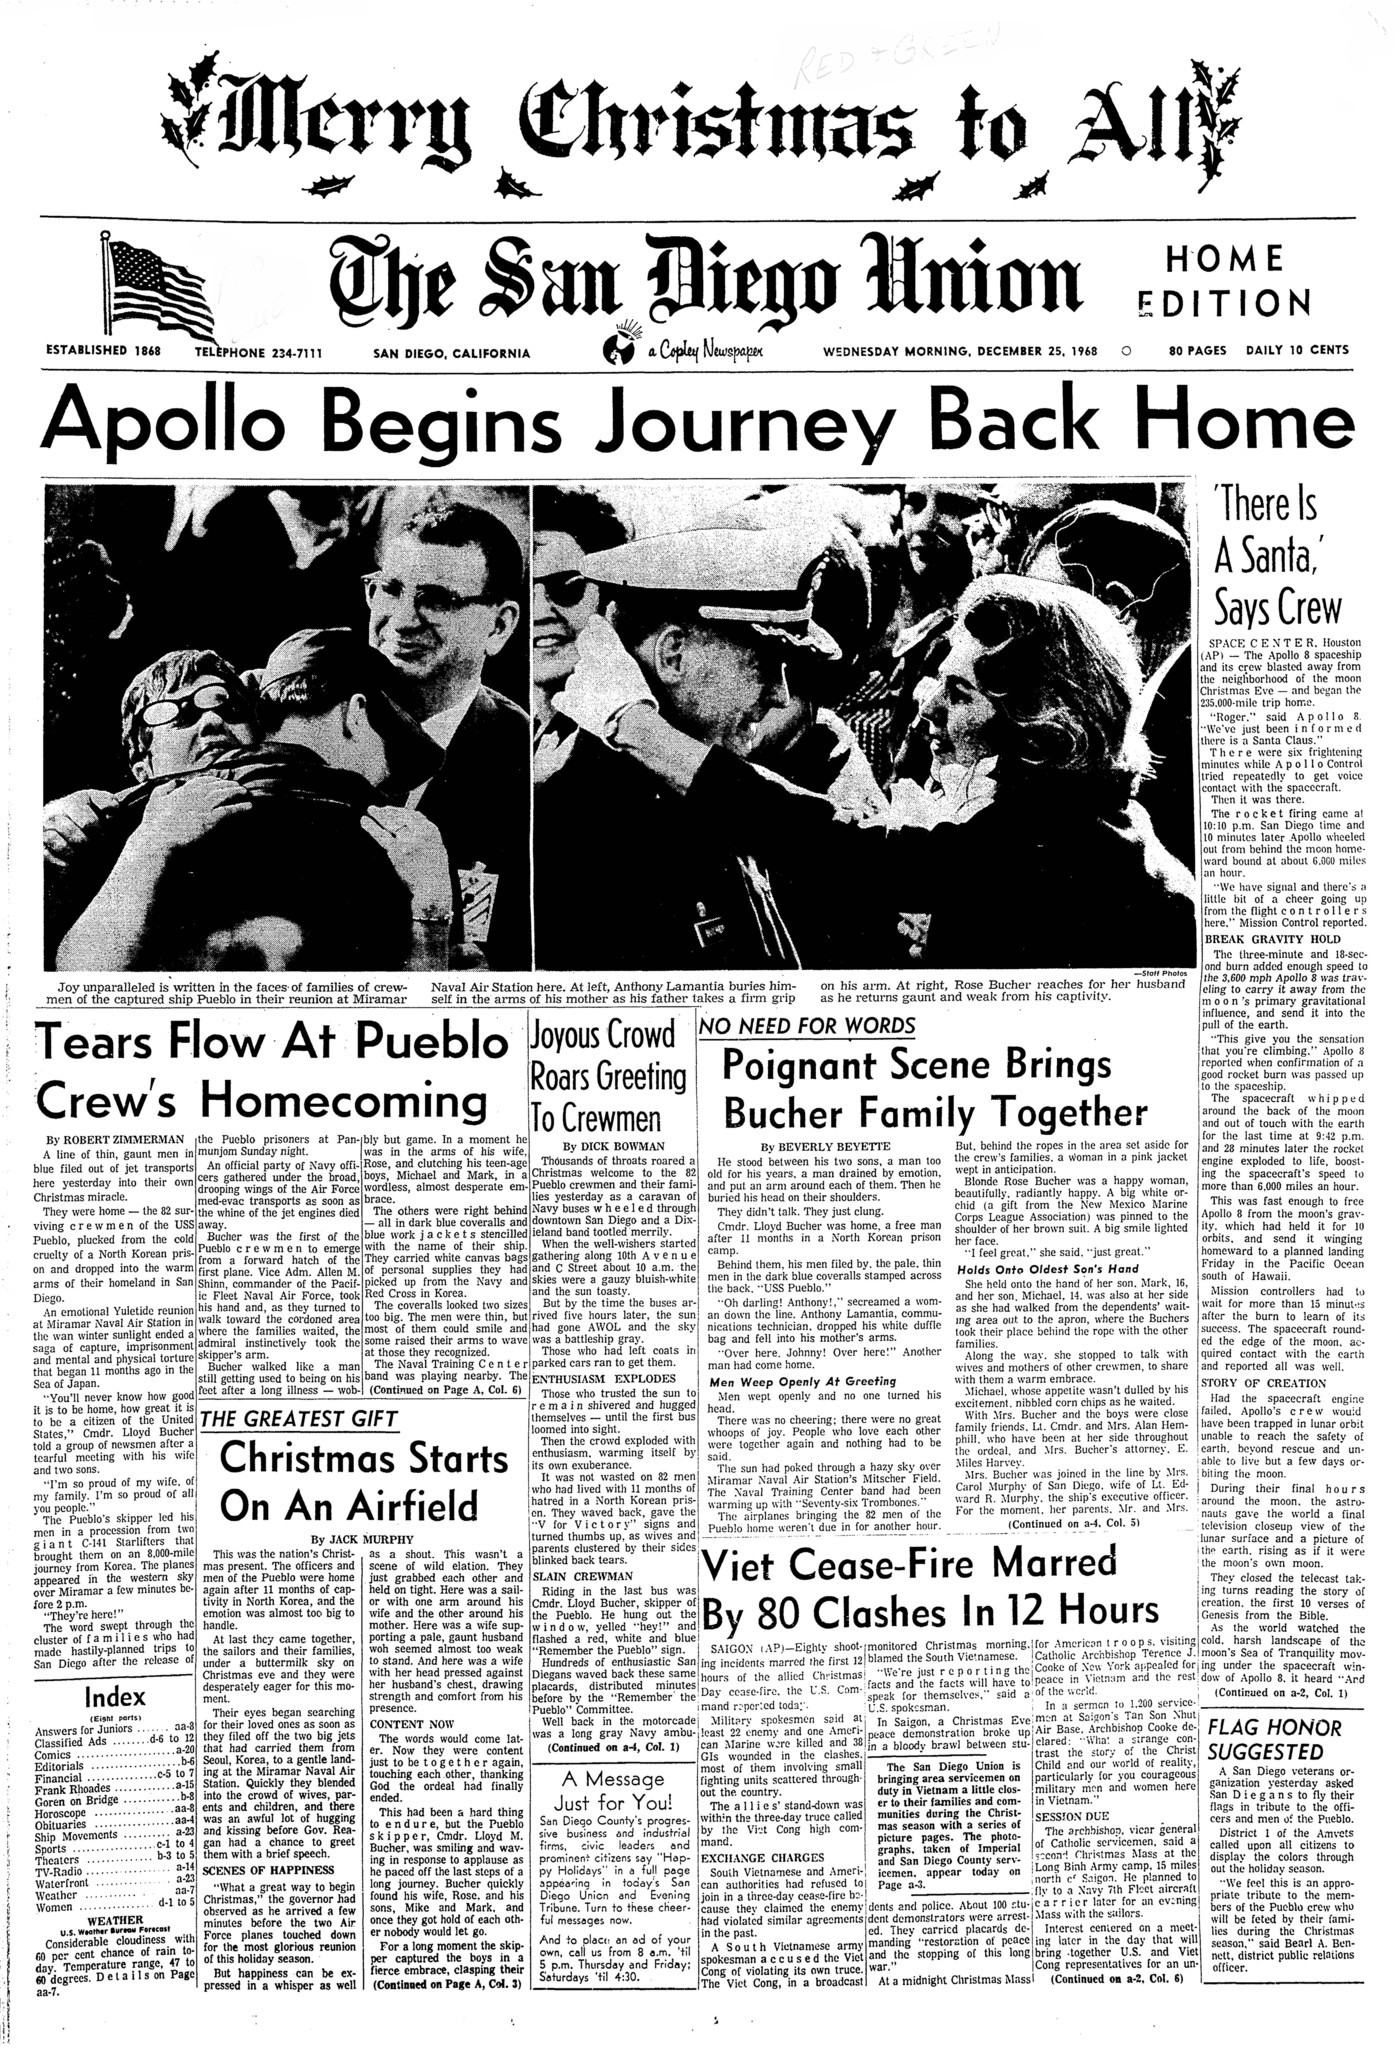 December 25, 1968